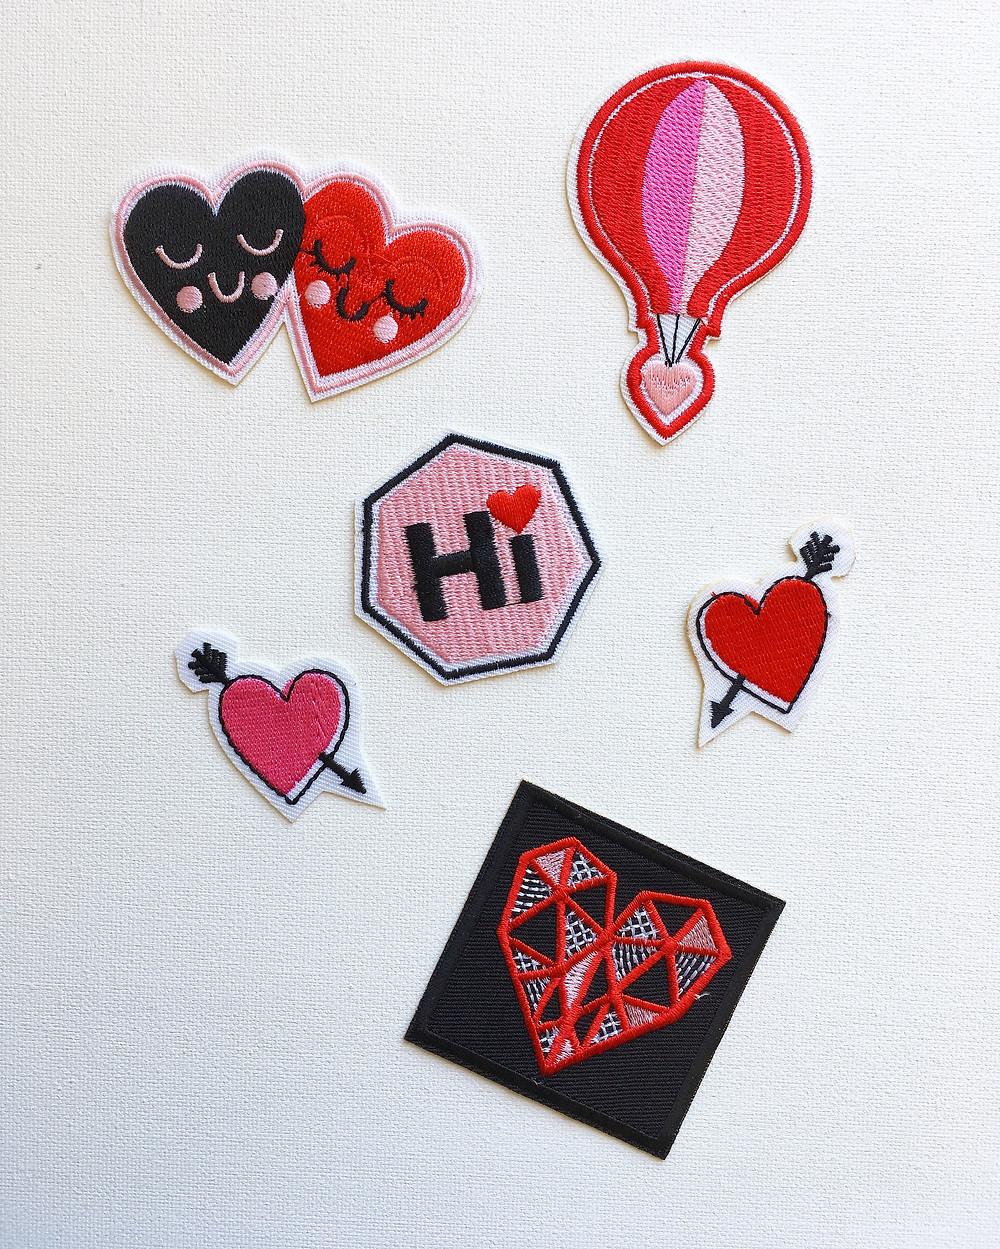 Claire's Valentine's Patches - Heartthrob Studio